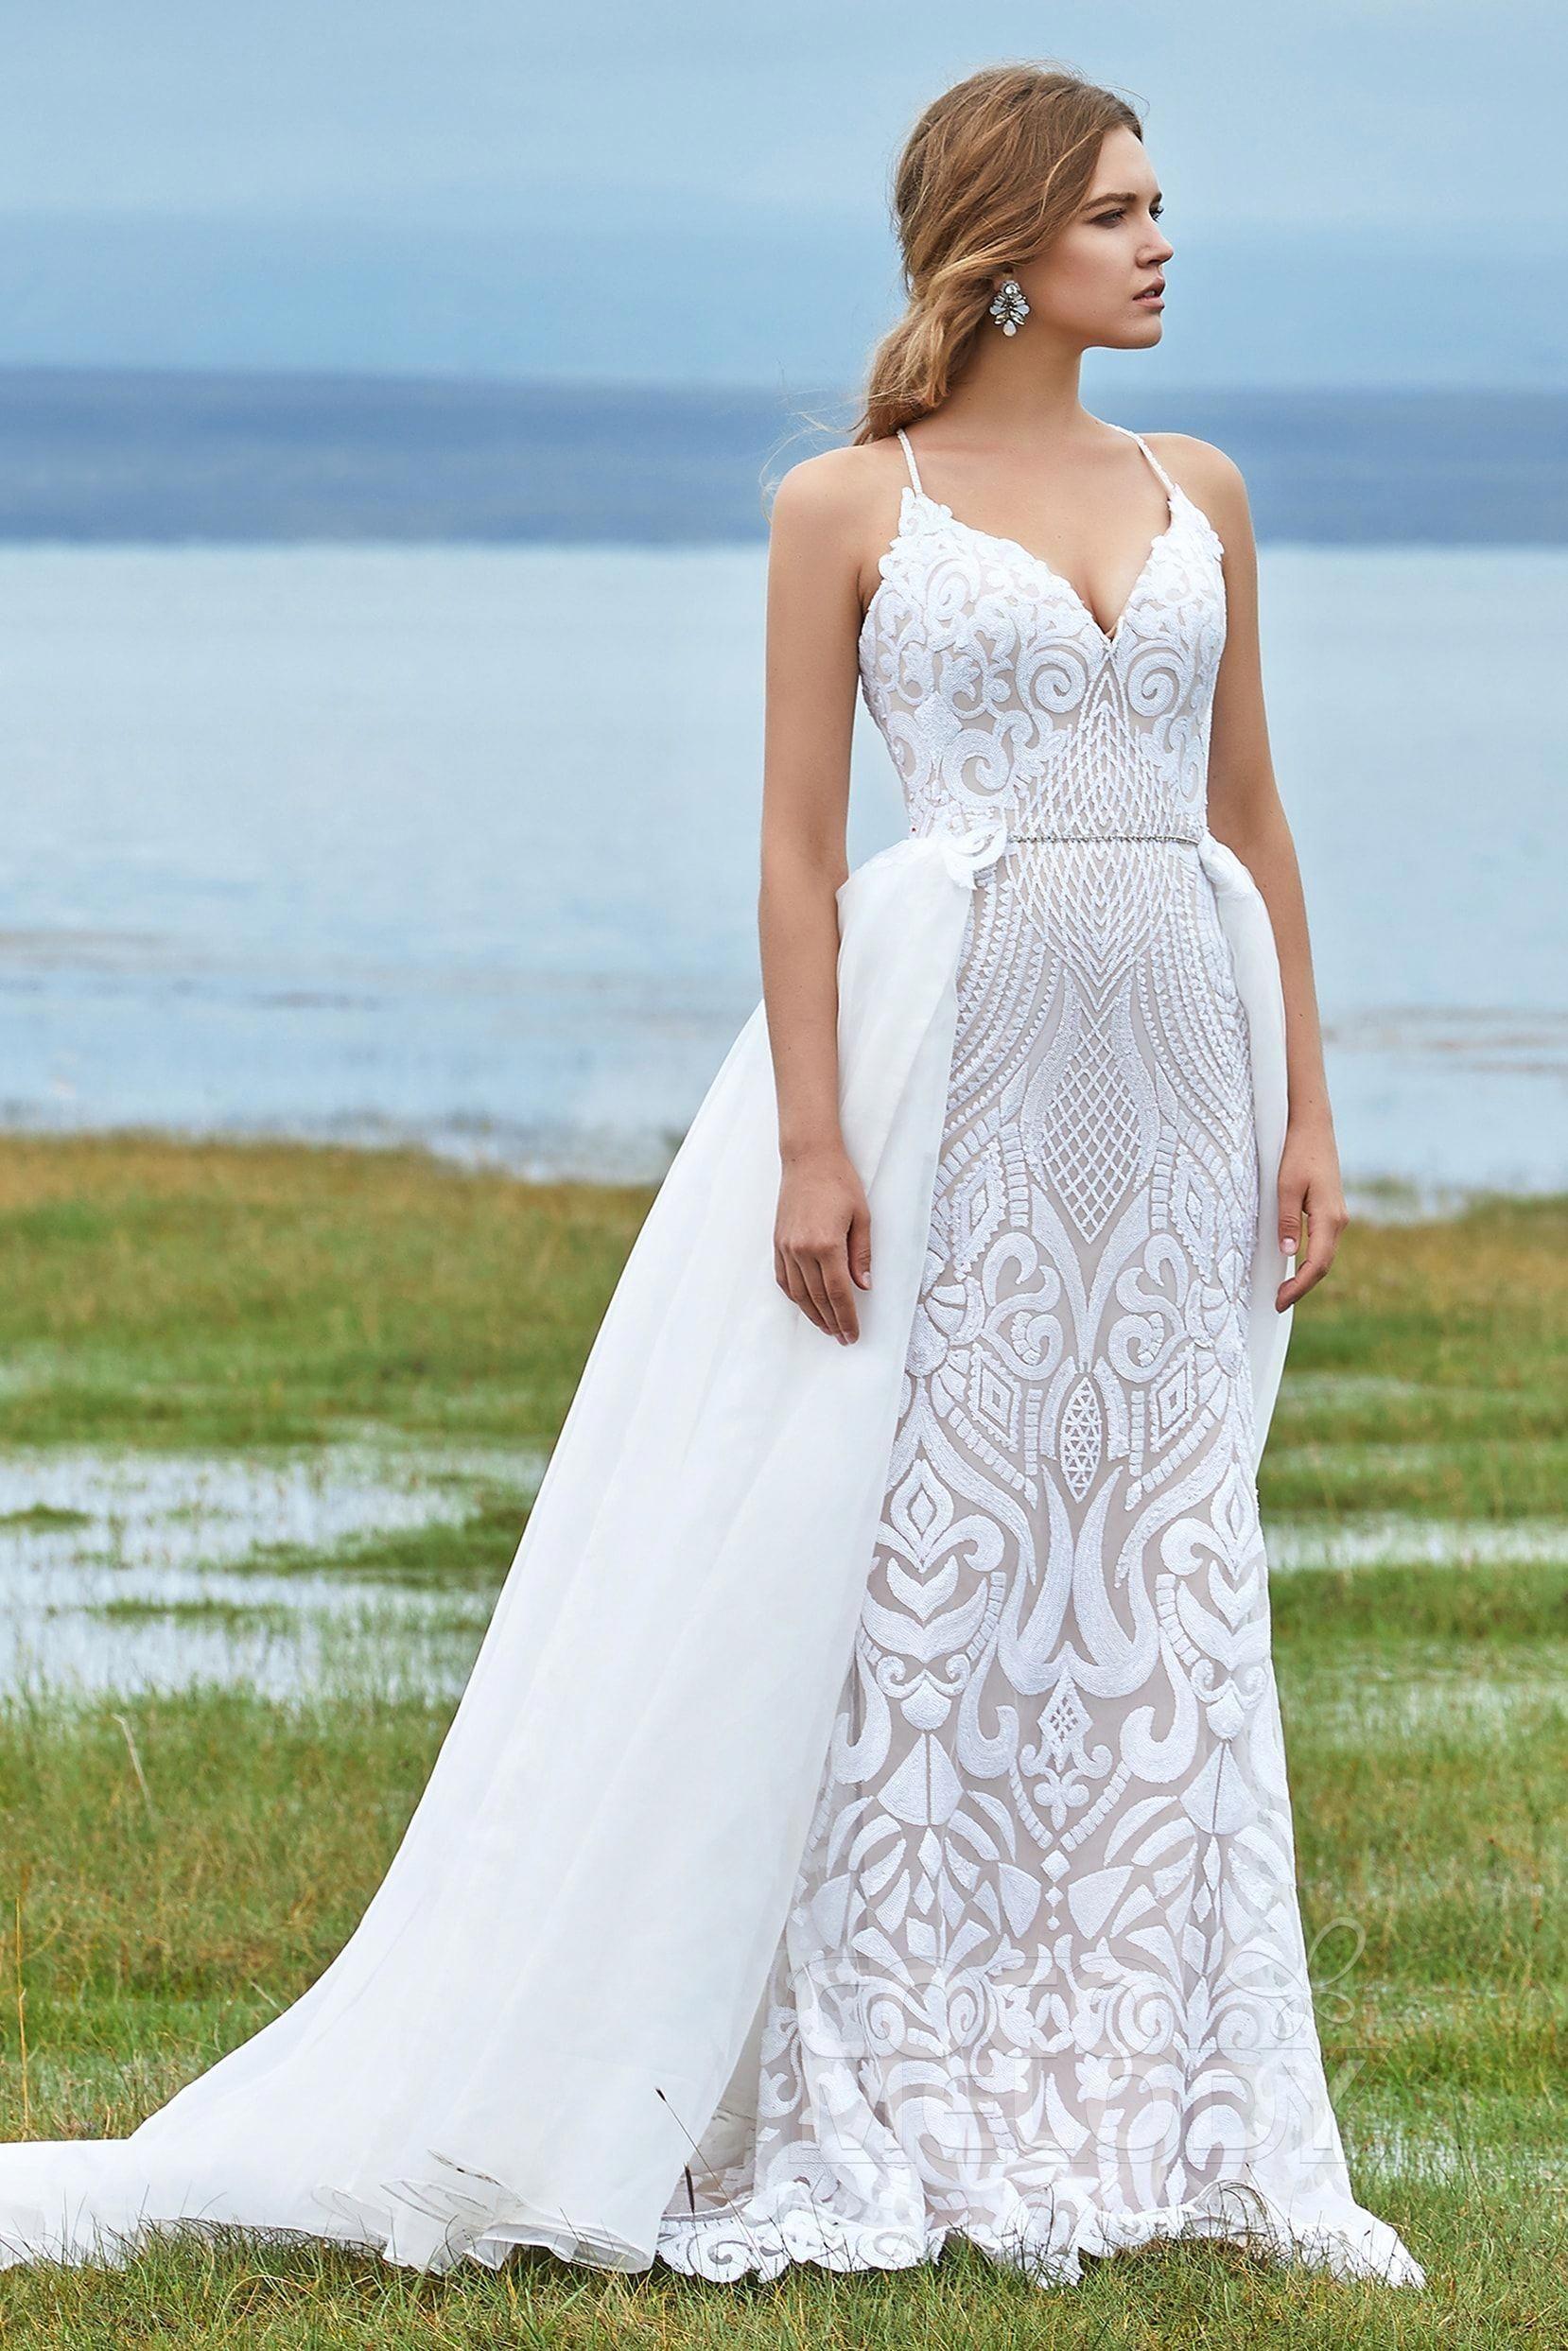 23+ Vietnamese wedding dresses for sale information